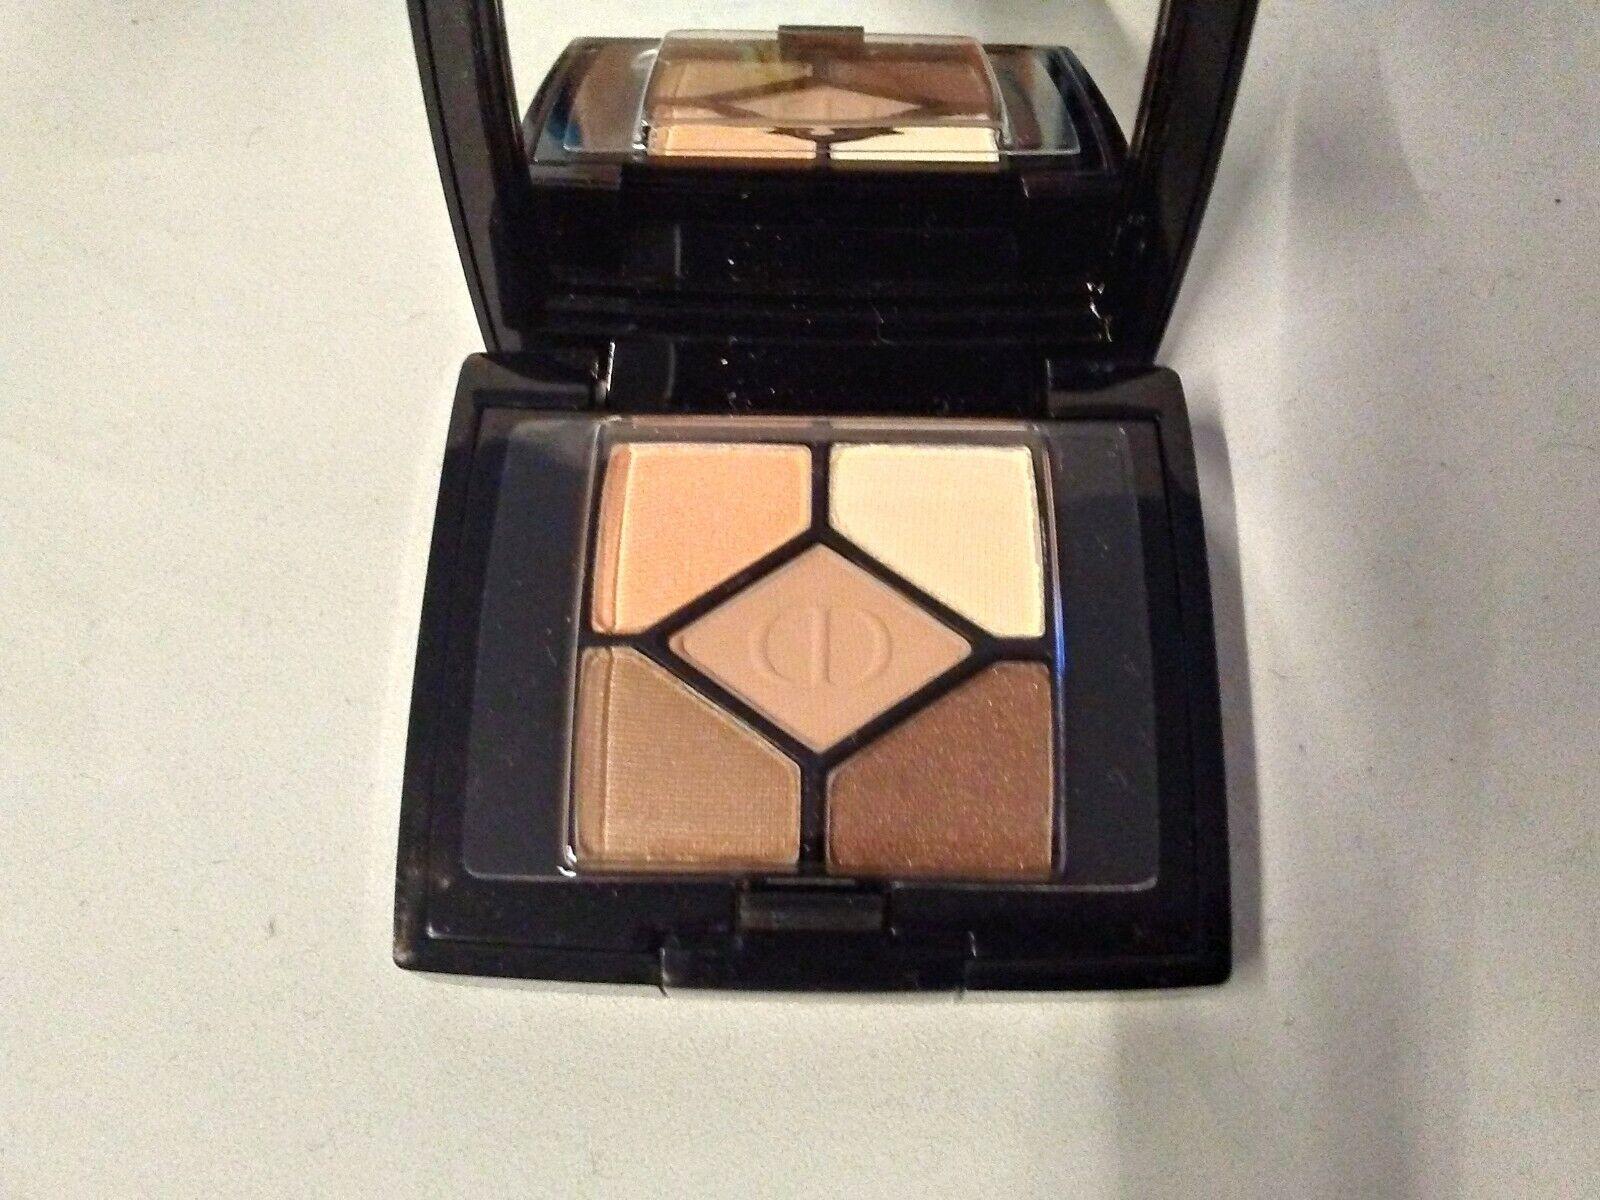 Christian Dior 5 Couleurs Eyeshadow Palette Mini #647 Undres